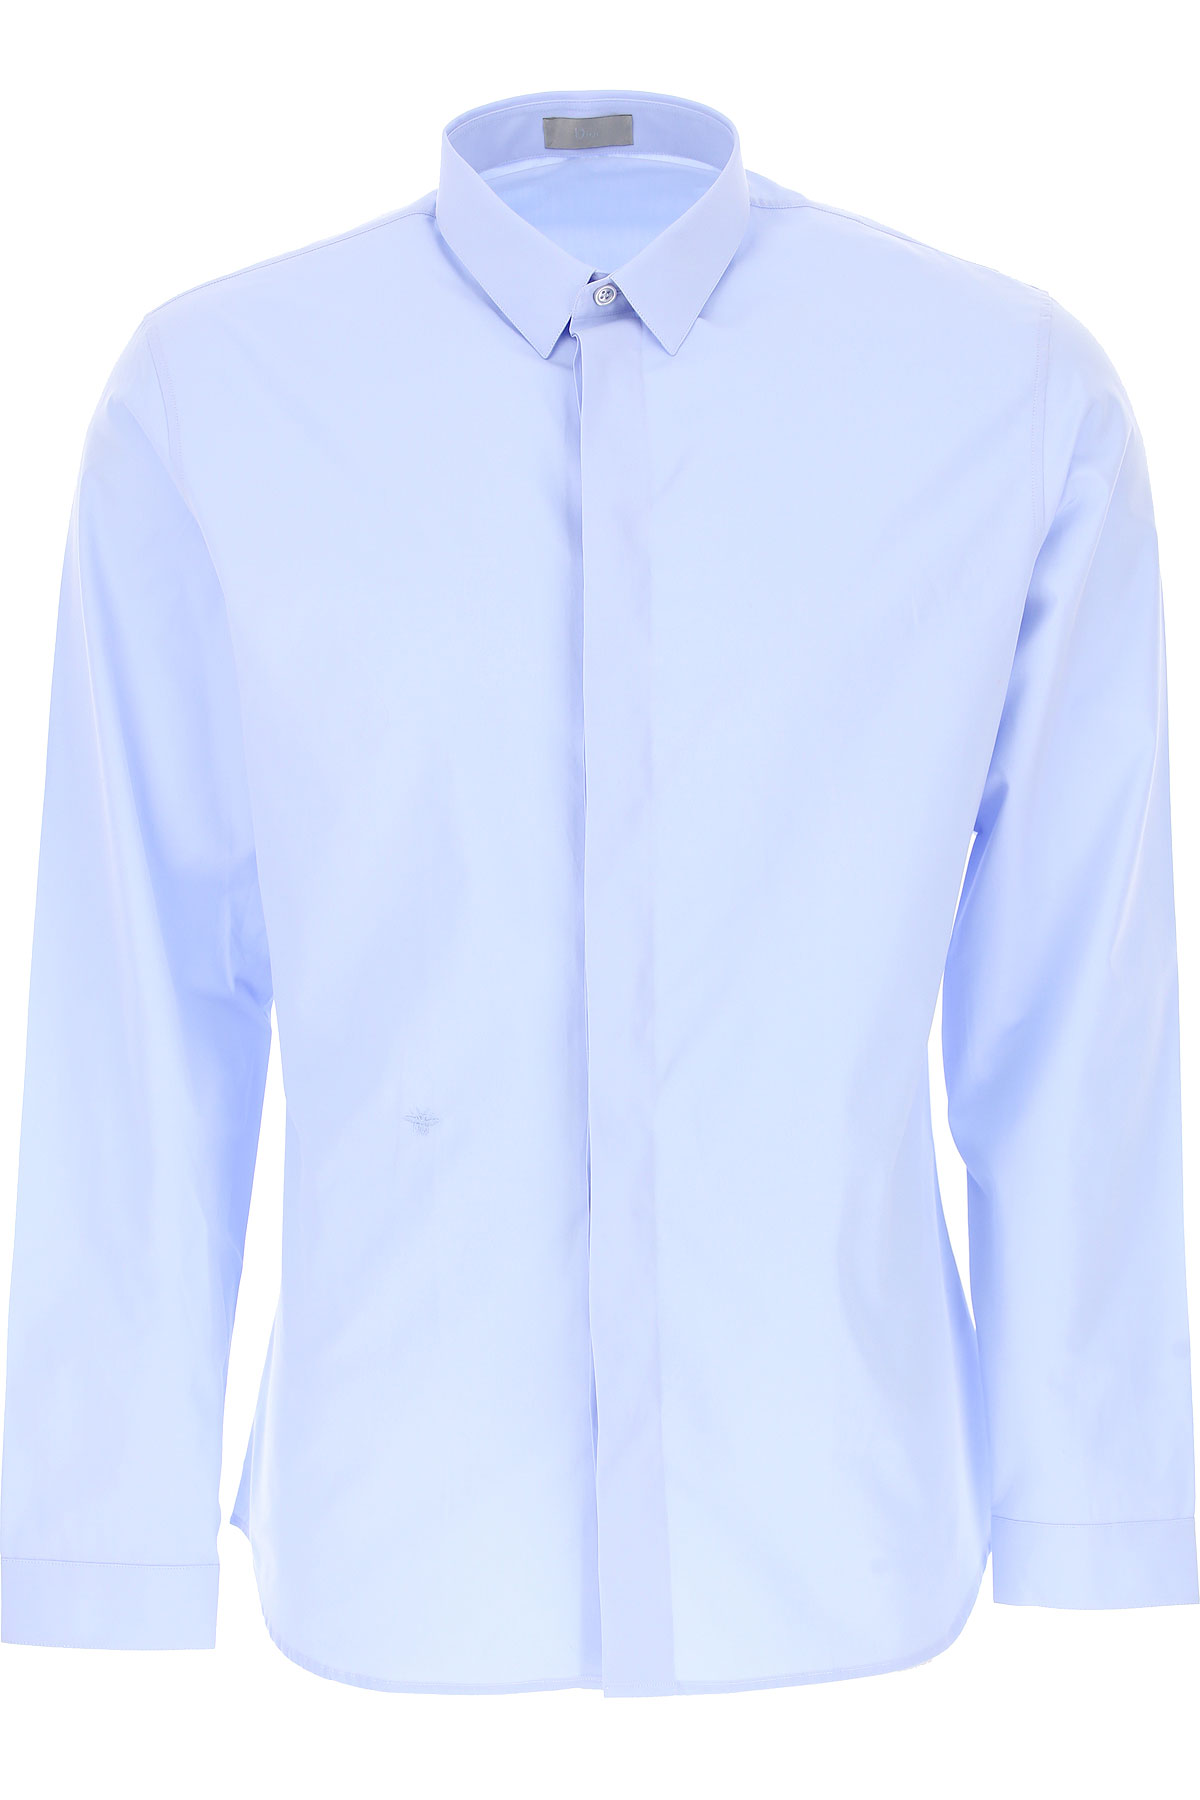 Christian Dior Chemise Homme, Bleu, Coton, 2017, 39 40 41 42